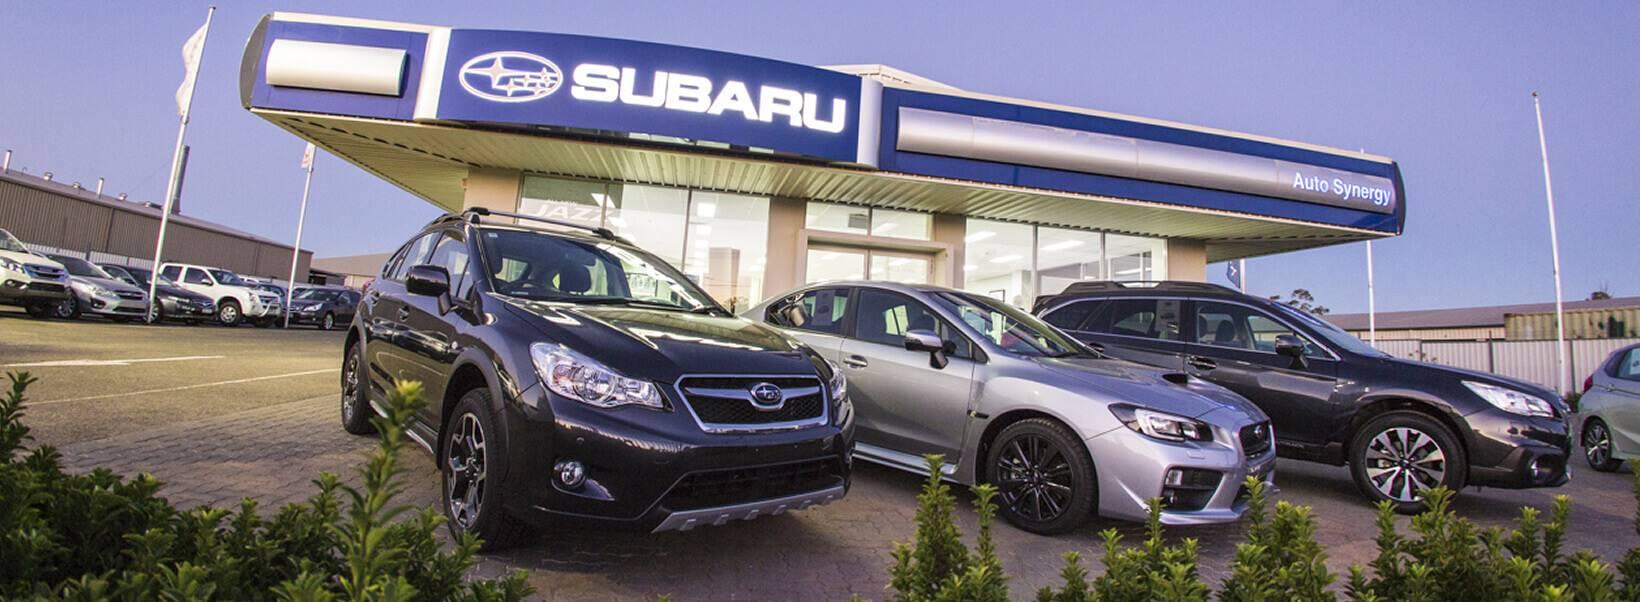 Auto Synergy Subaru